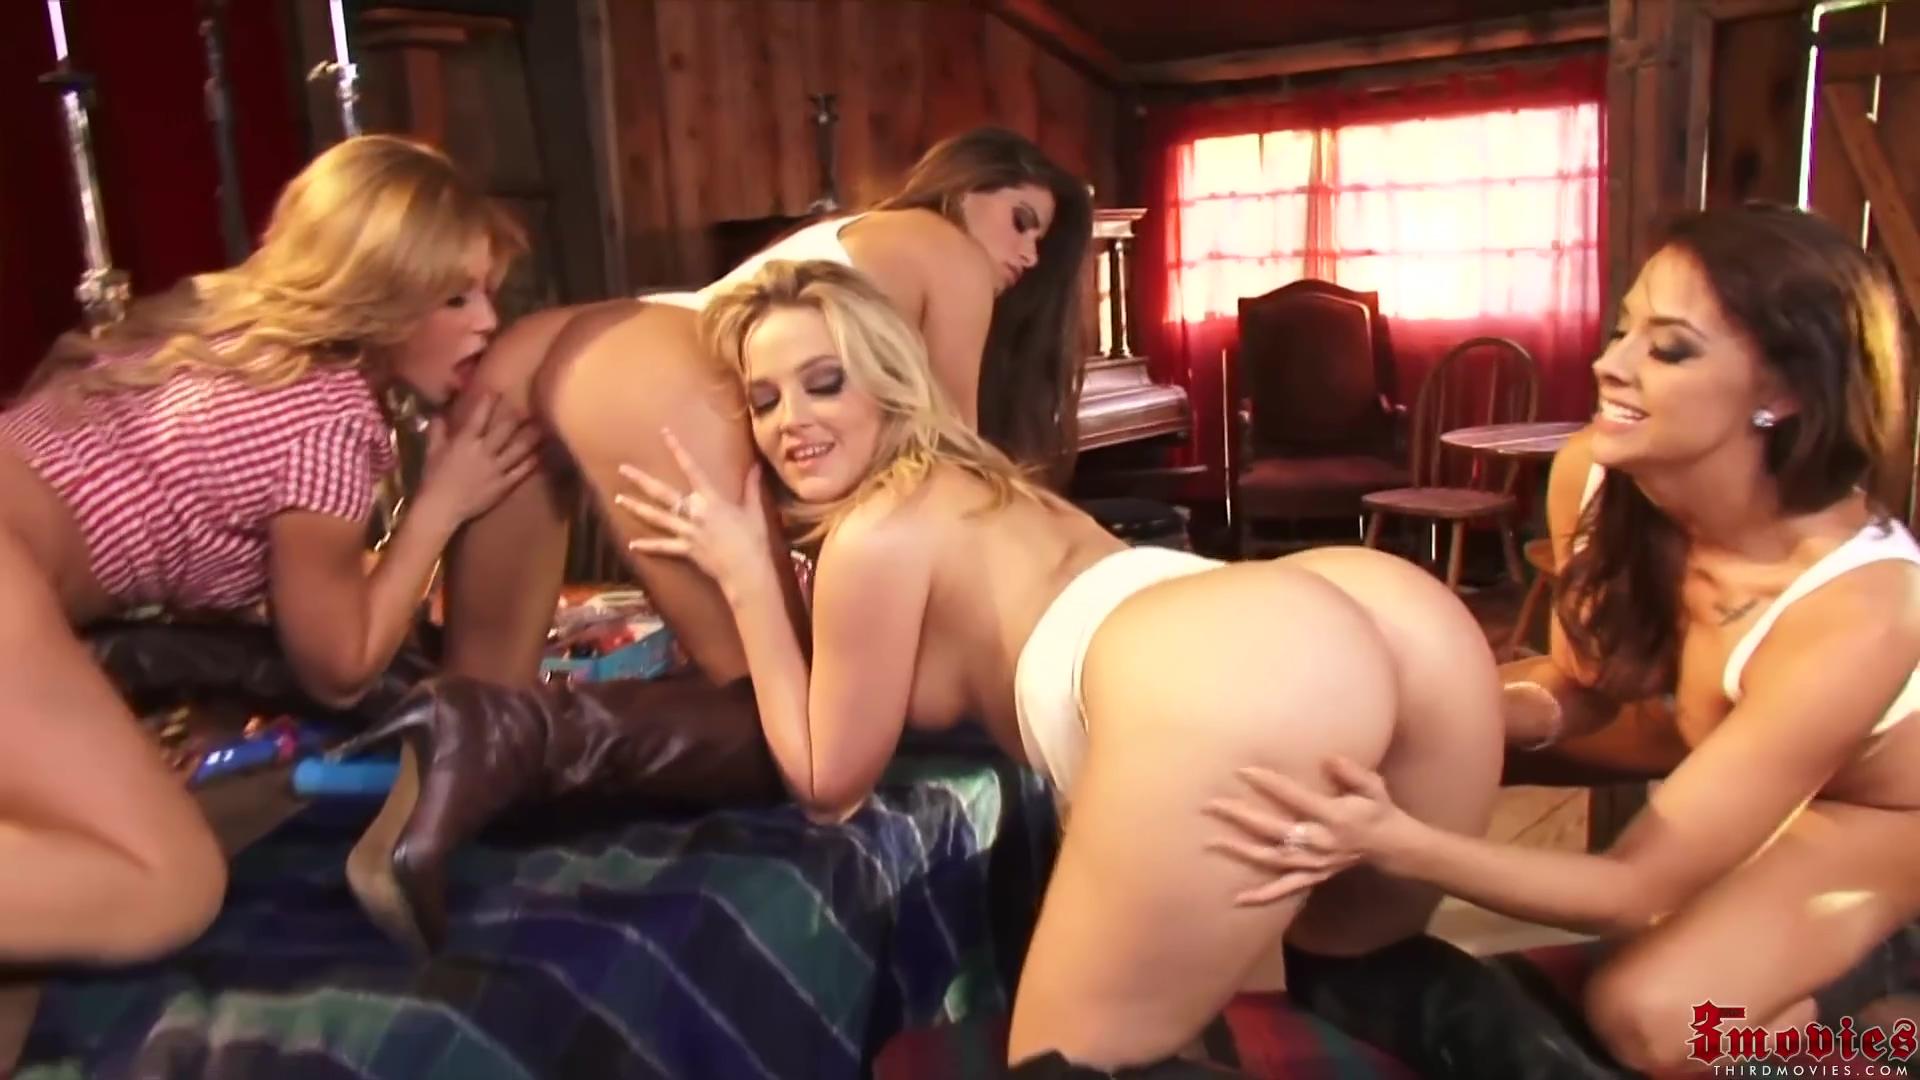 Video 1472868404: brooklyn lee, alexis texas, lesbian group sex teen, blonde teen lesbian toying, teen lesbians blonde brunette, tattooed teen lesbian, teen lesbian hd